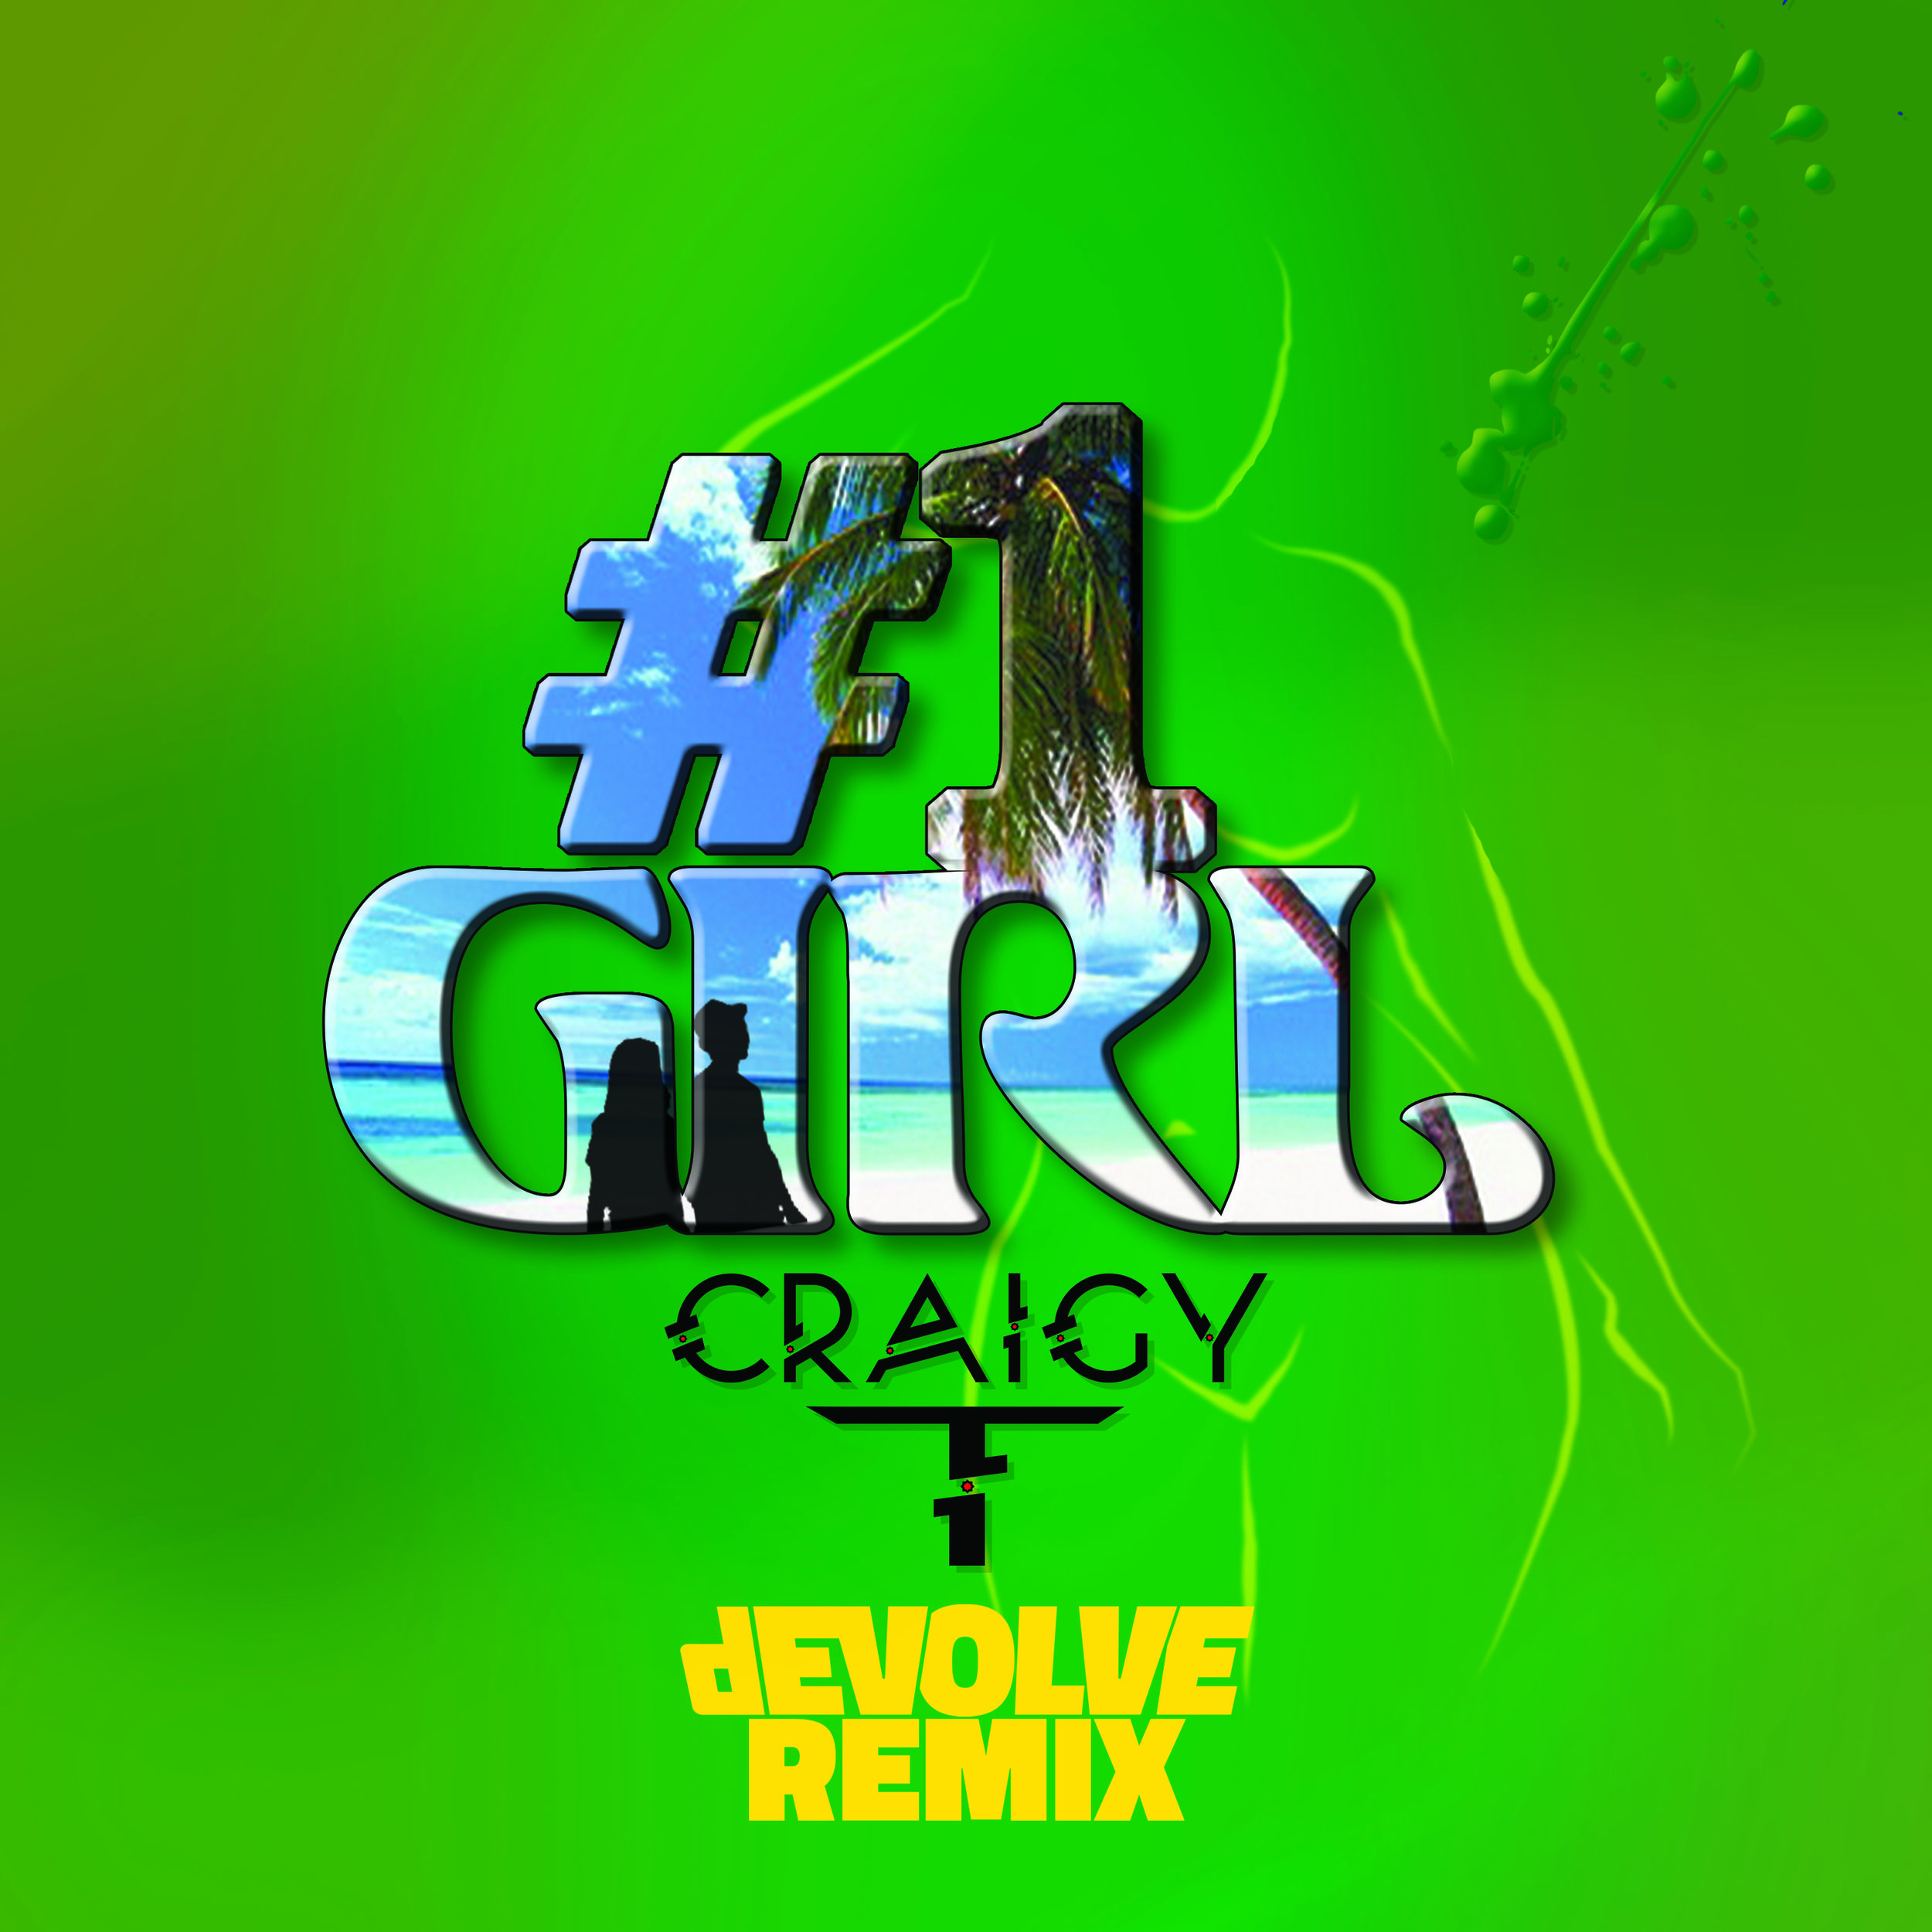 #1 Girl (dEVOLVE Remix) - Craigy T Art.jpg